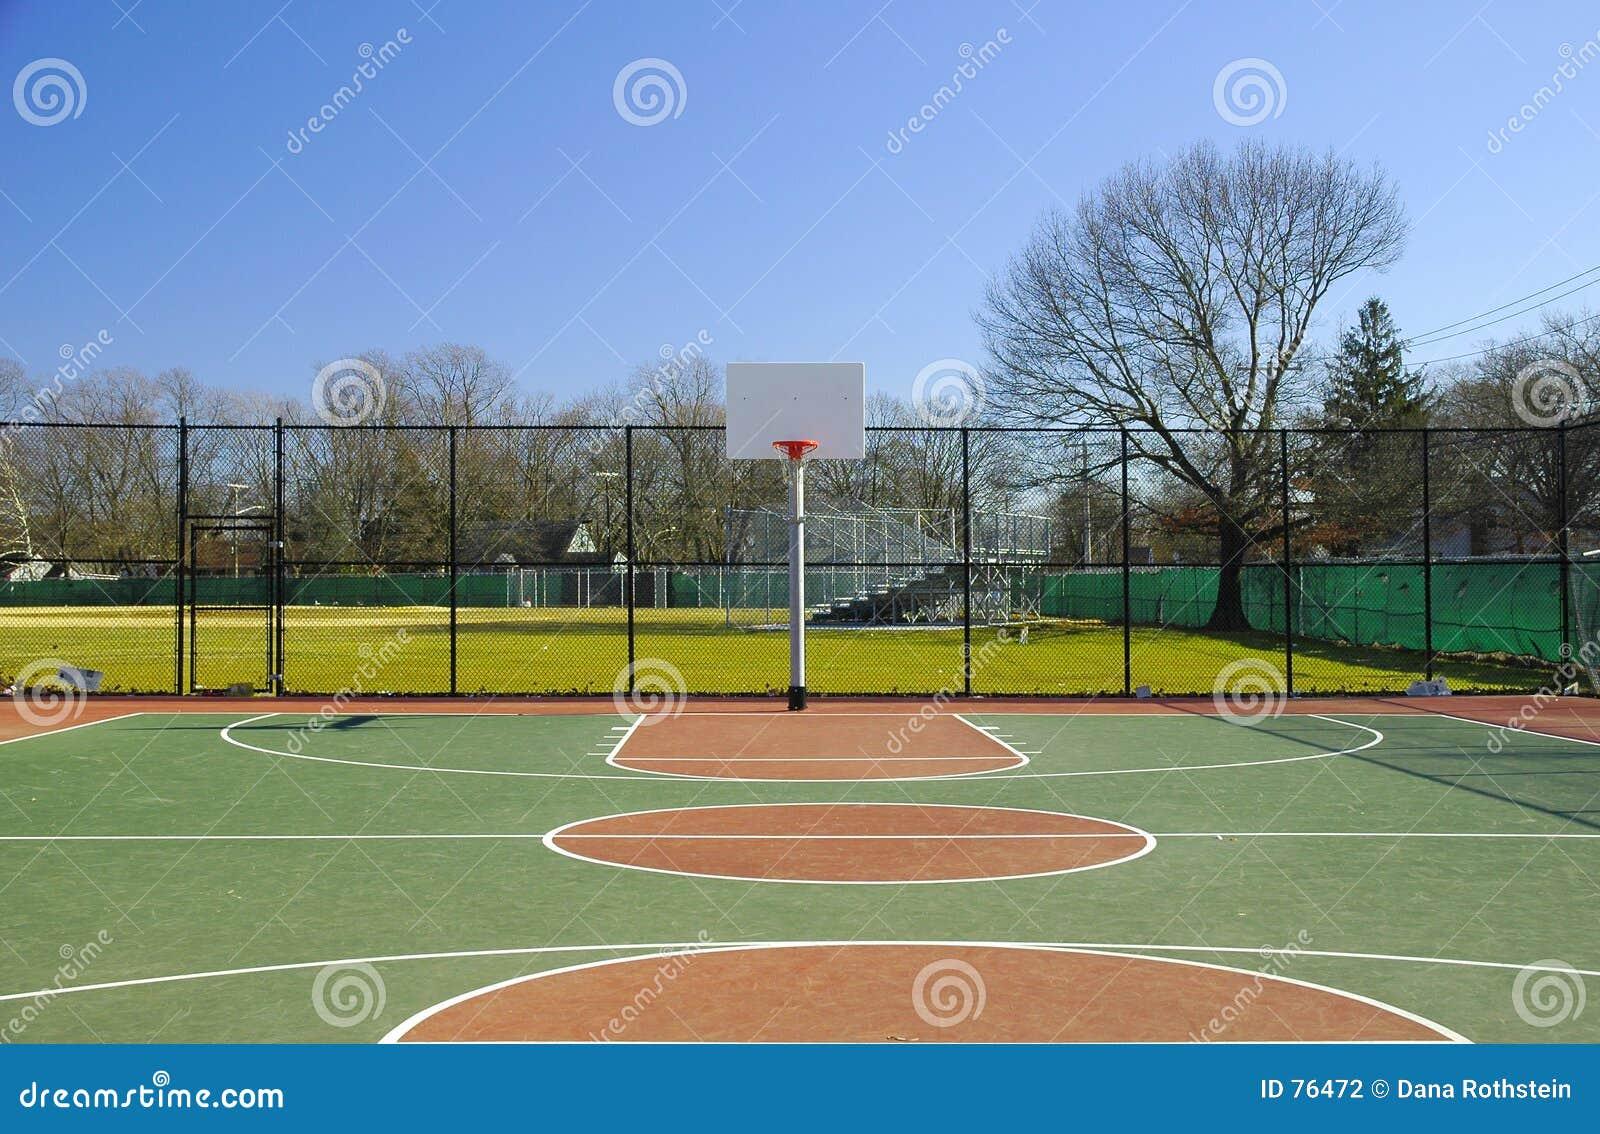 terrain de basket 2 photo stock image du playground cercle 76472. Black Bedroom Furniture Sets. Home Design Ideas